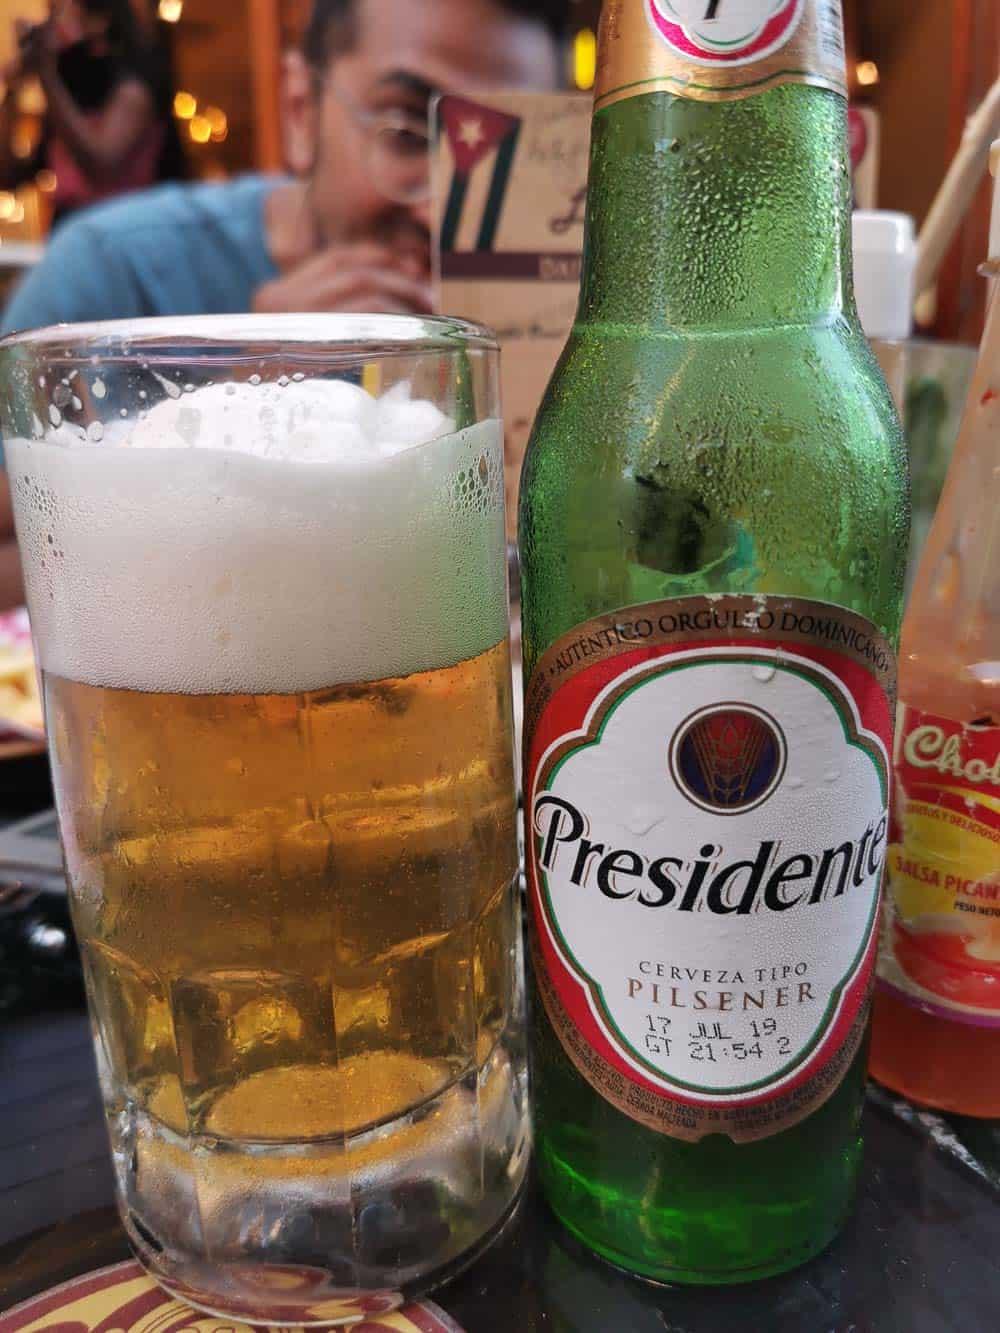 Presidente beer sold in Cuba